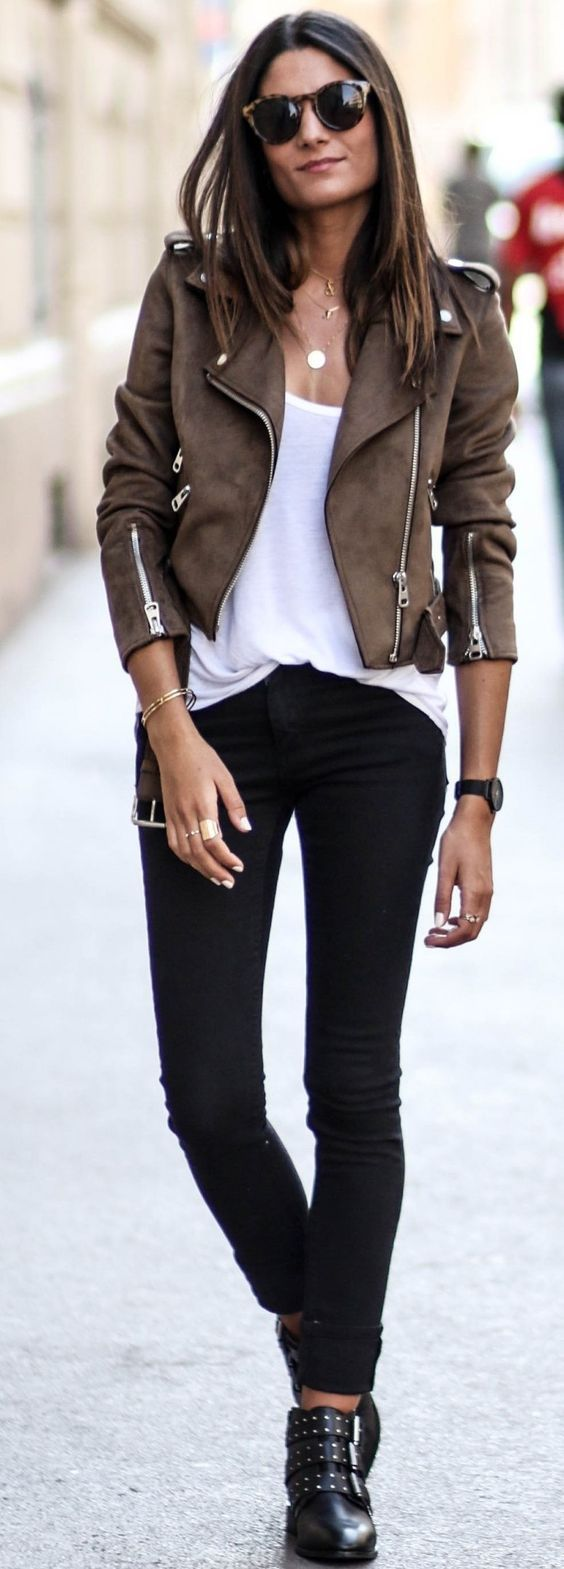 17  best ideas about Black Jeans on Pinterest | Black pants outfit ...